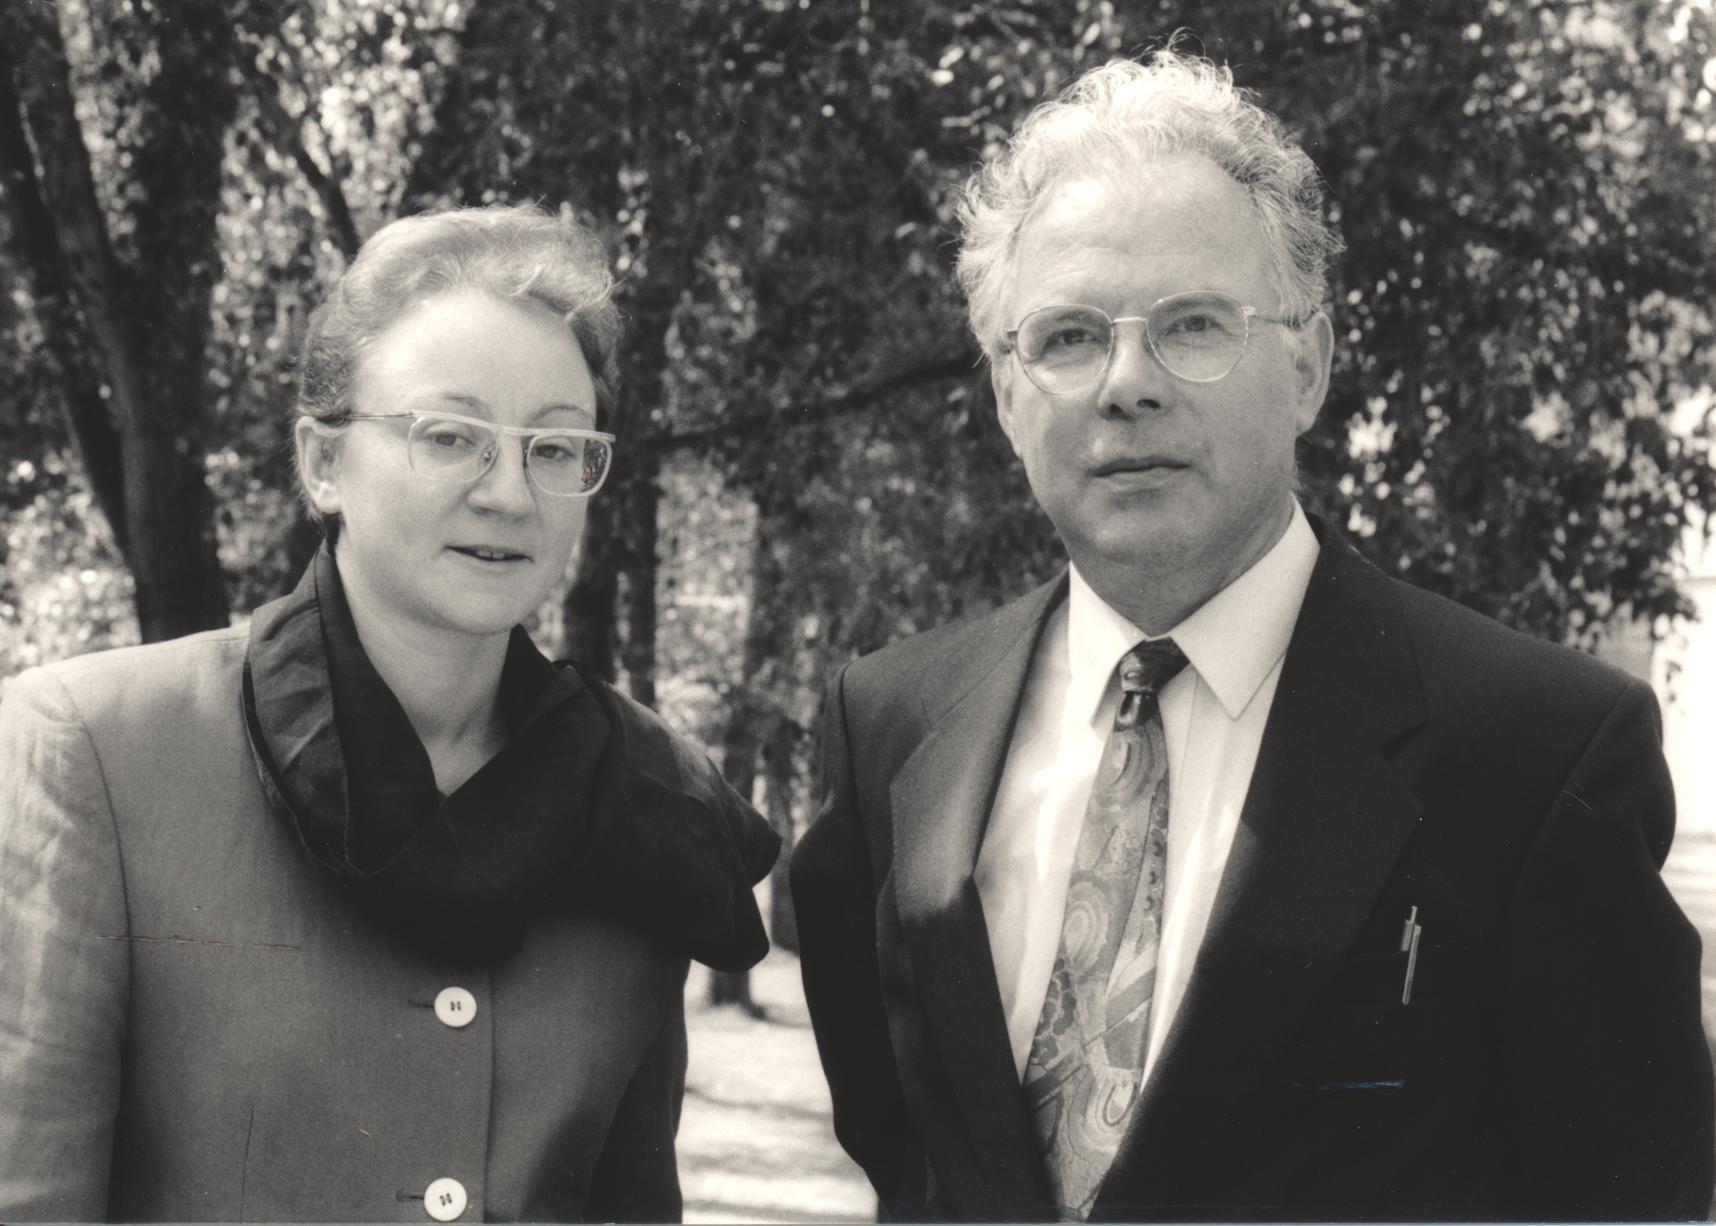 XIV. Imago Mundi-Kongress 1993, Innsbruck, Dr. Angelika Malinar, Prof. Andreas Resch